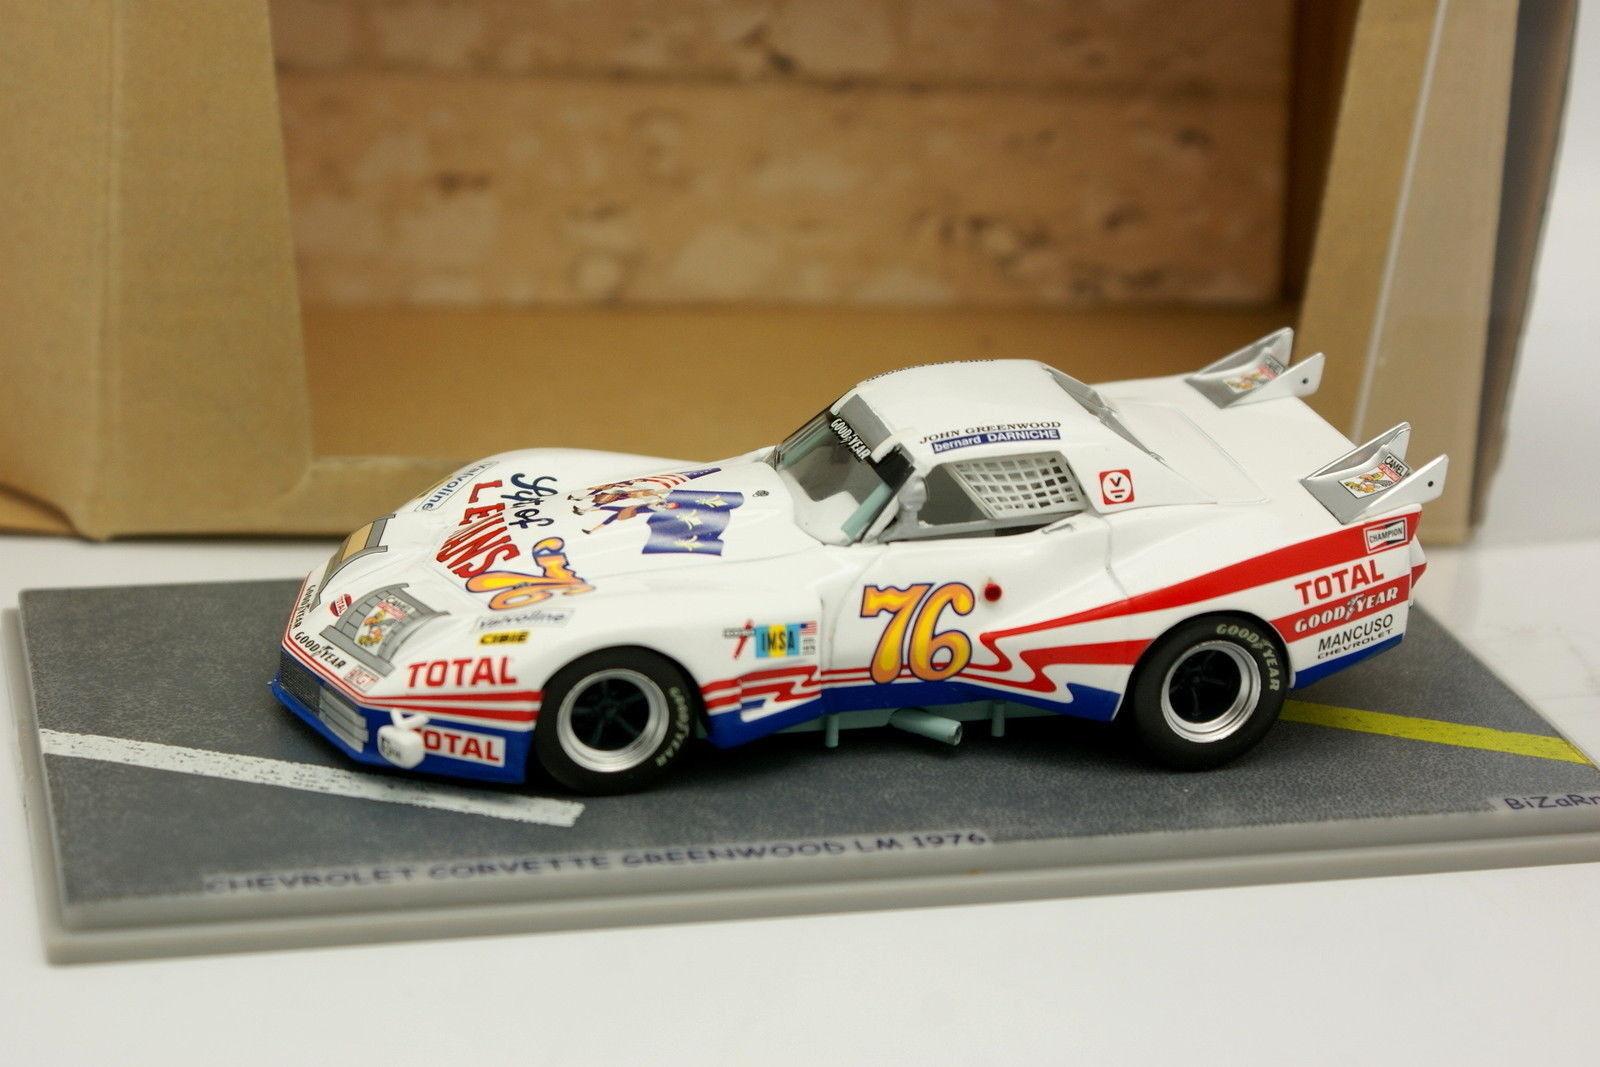 Bizarre 1/43 - Chevrolet Corvette Greenwood Le Mans 1976 N°76